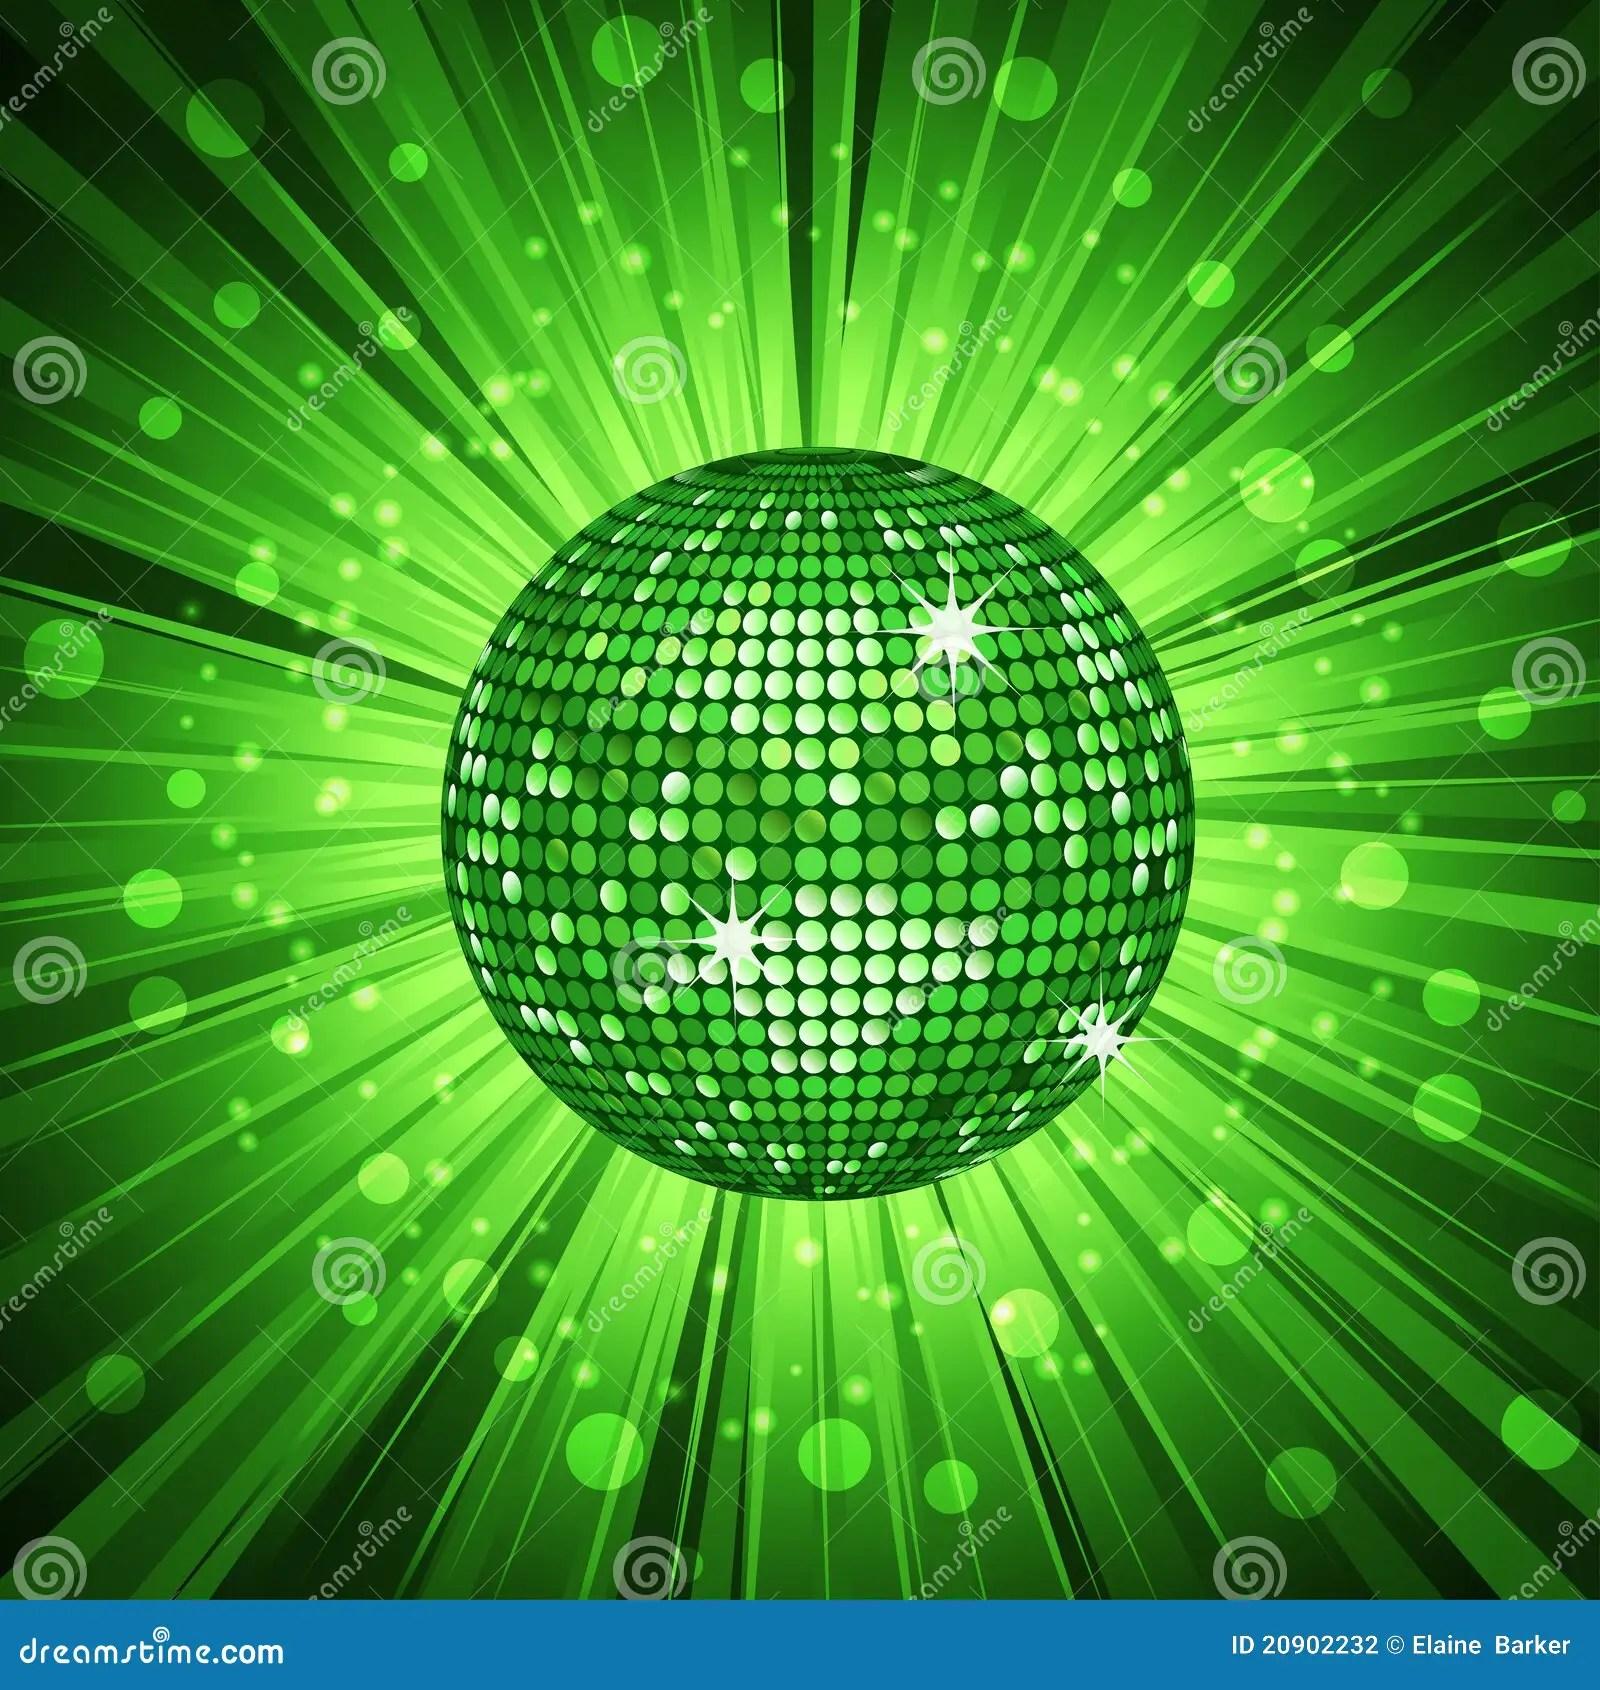 Neon Wallpaper Hd Green Disco Ball And Light Burst Stock Vector